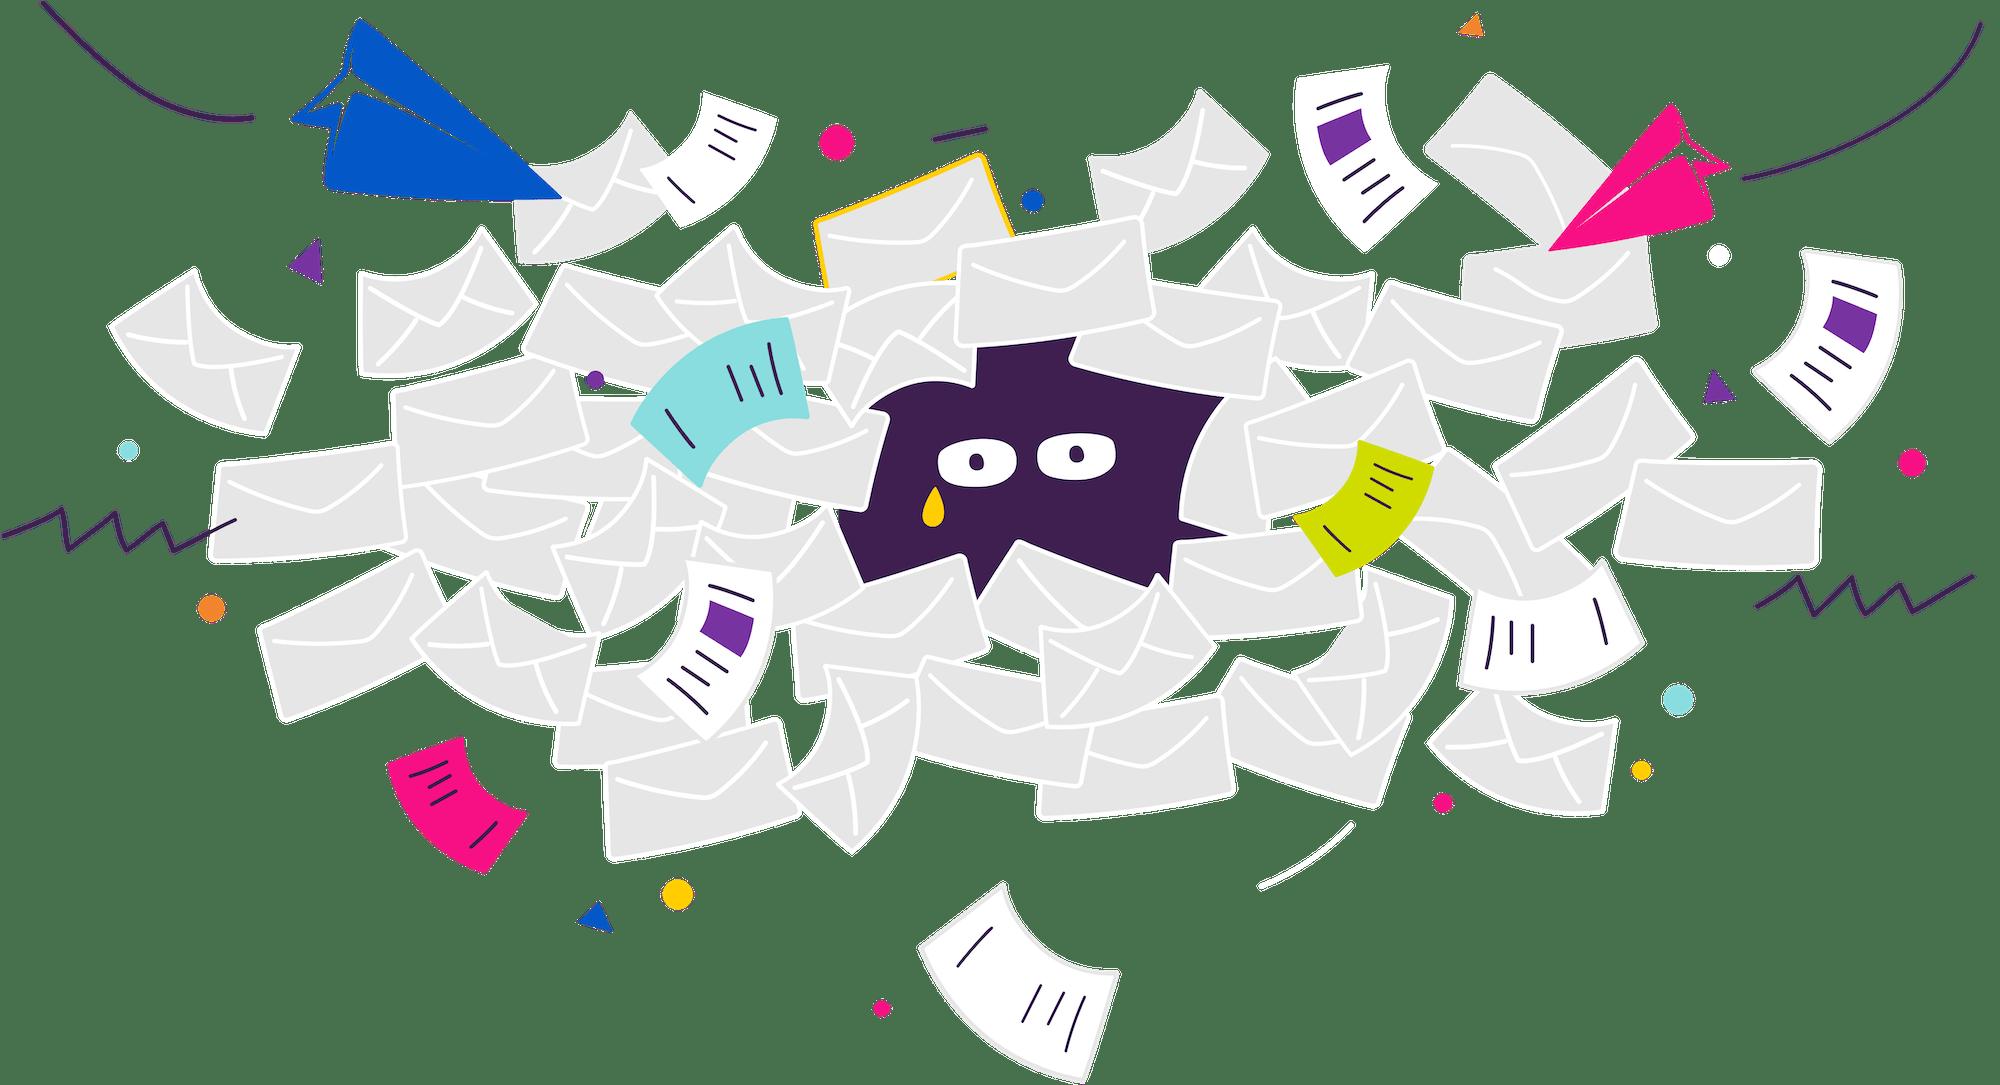 Email overload illustration